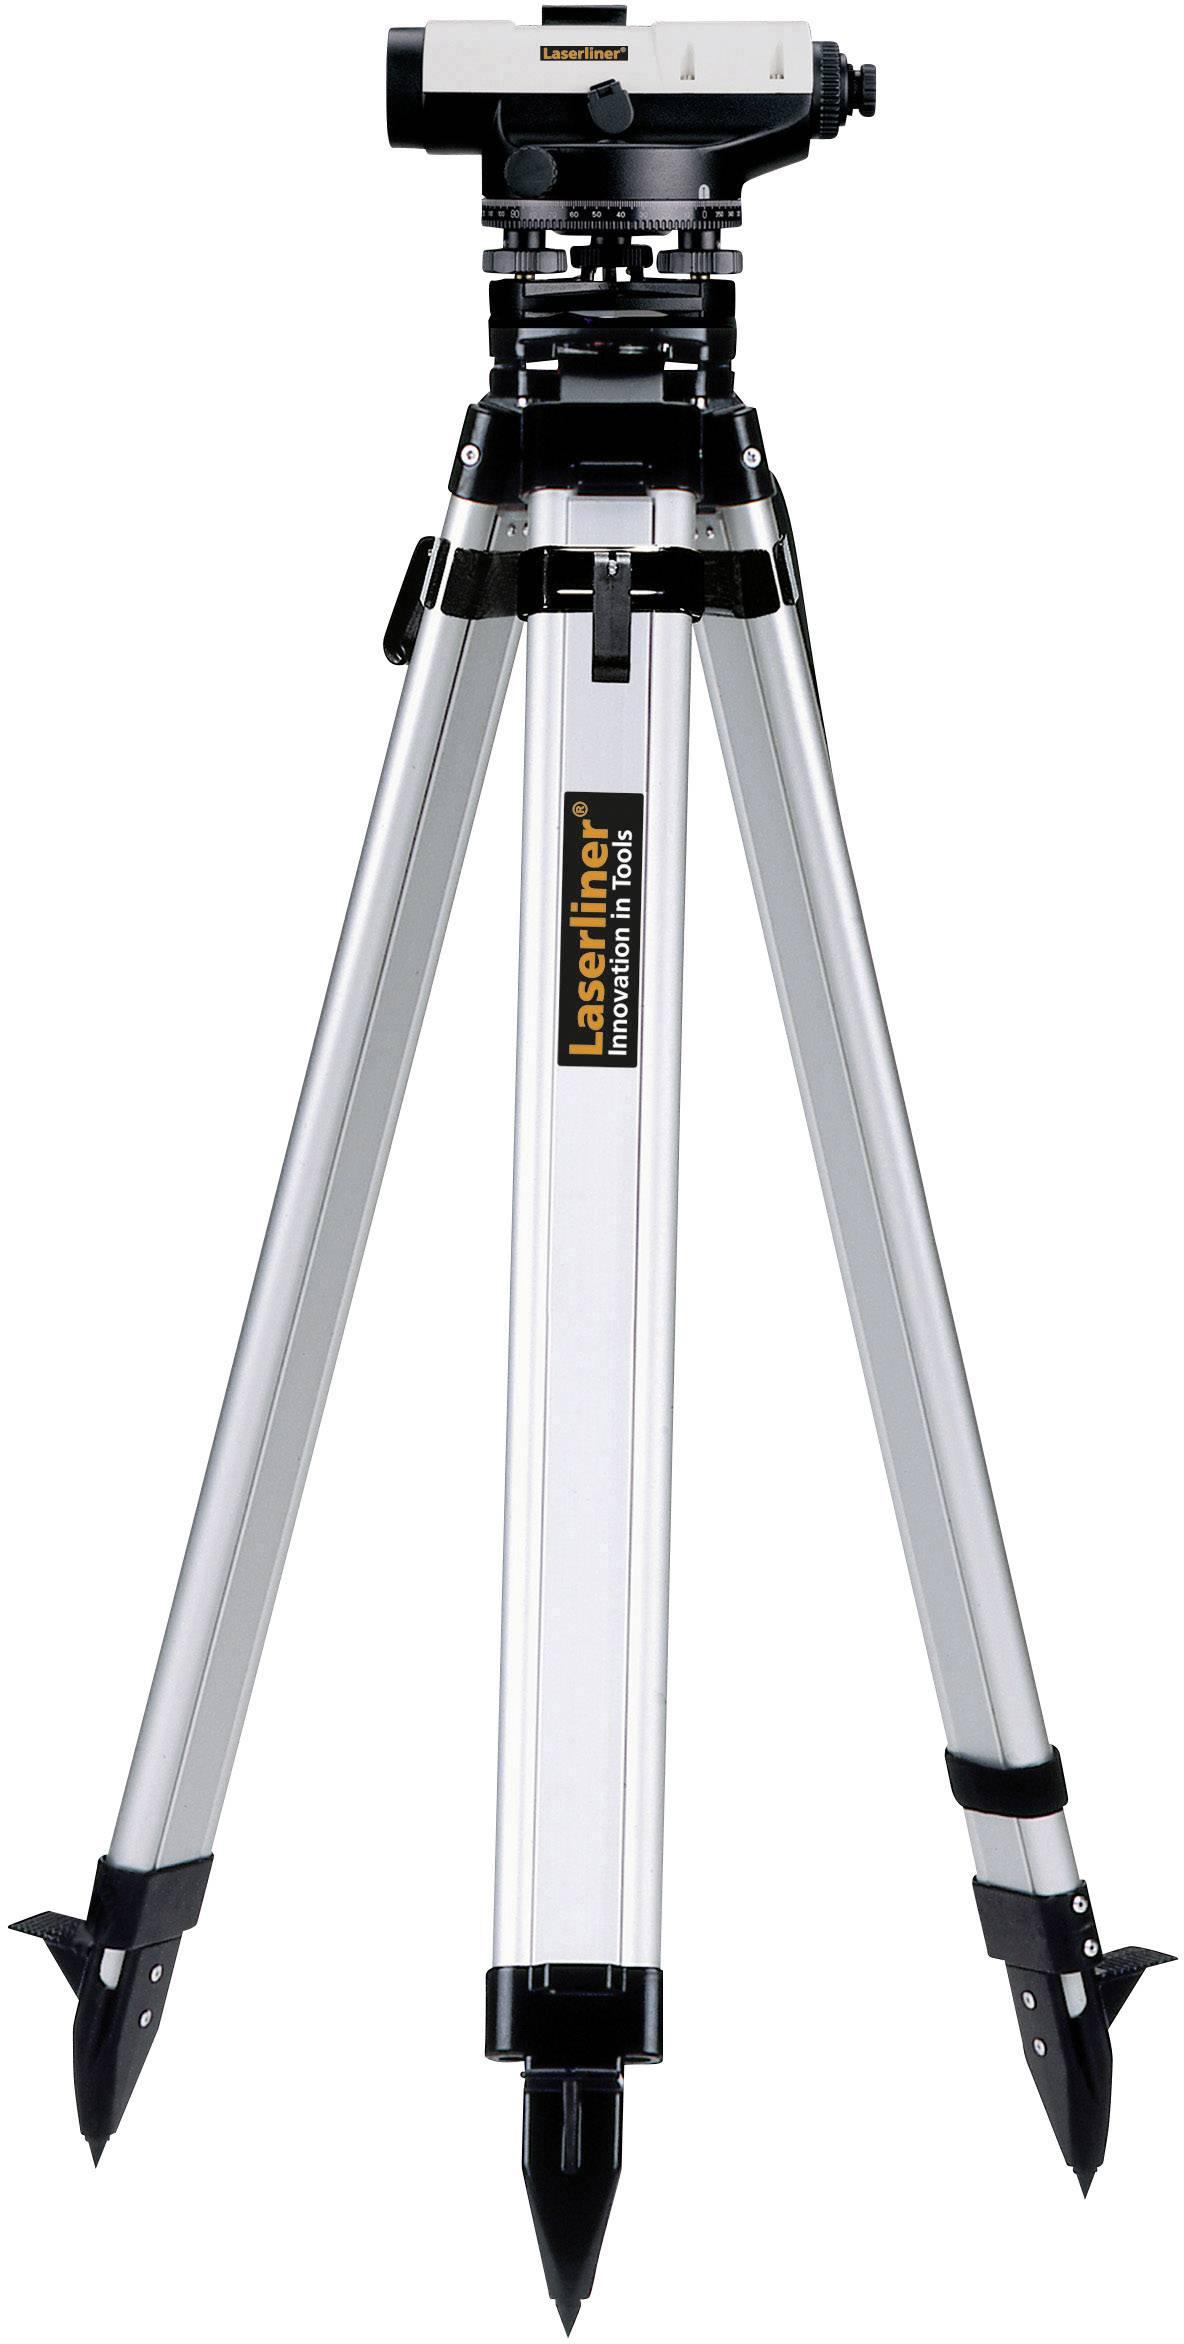 Vr. statívu, samonivelačná Laserliner AL 22 Classic-Set, ATT.INT.OPTICAL_MAGNIFICATION_MAX: 22 x